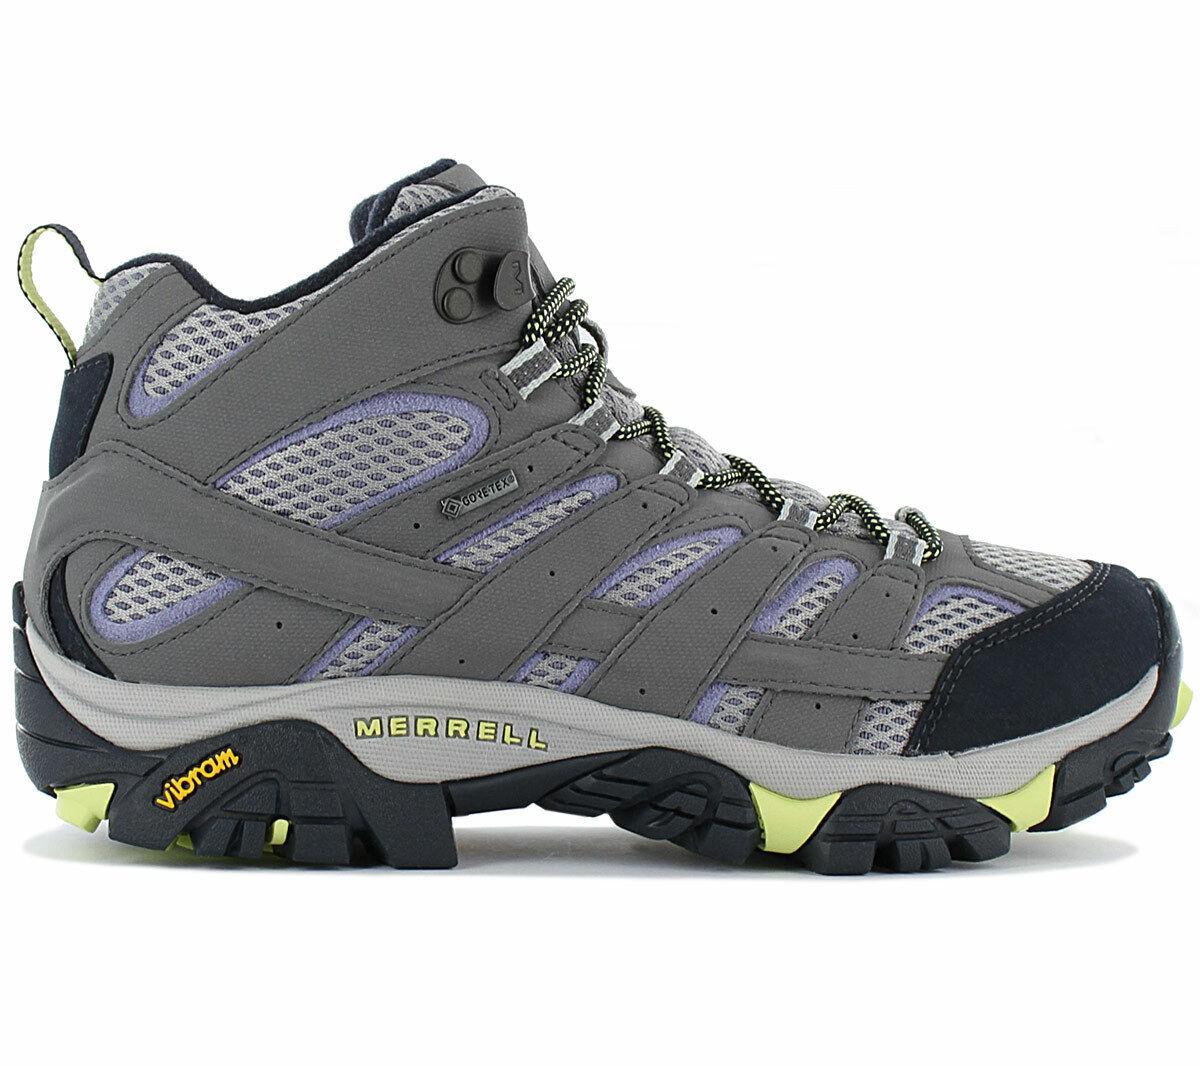 Merrell Moab 2 mid Gtx Gore-tex Women's Hiking shoes J19884 Outdoor Trekking